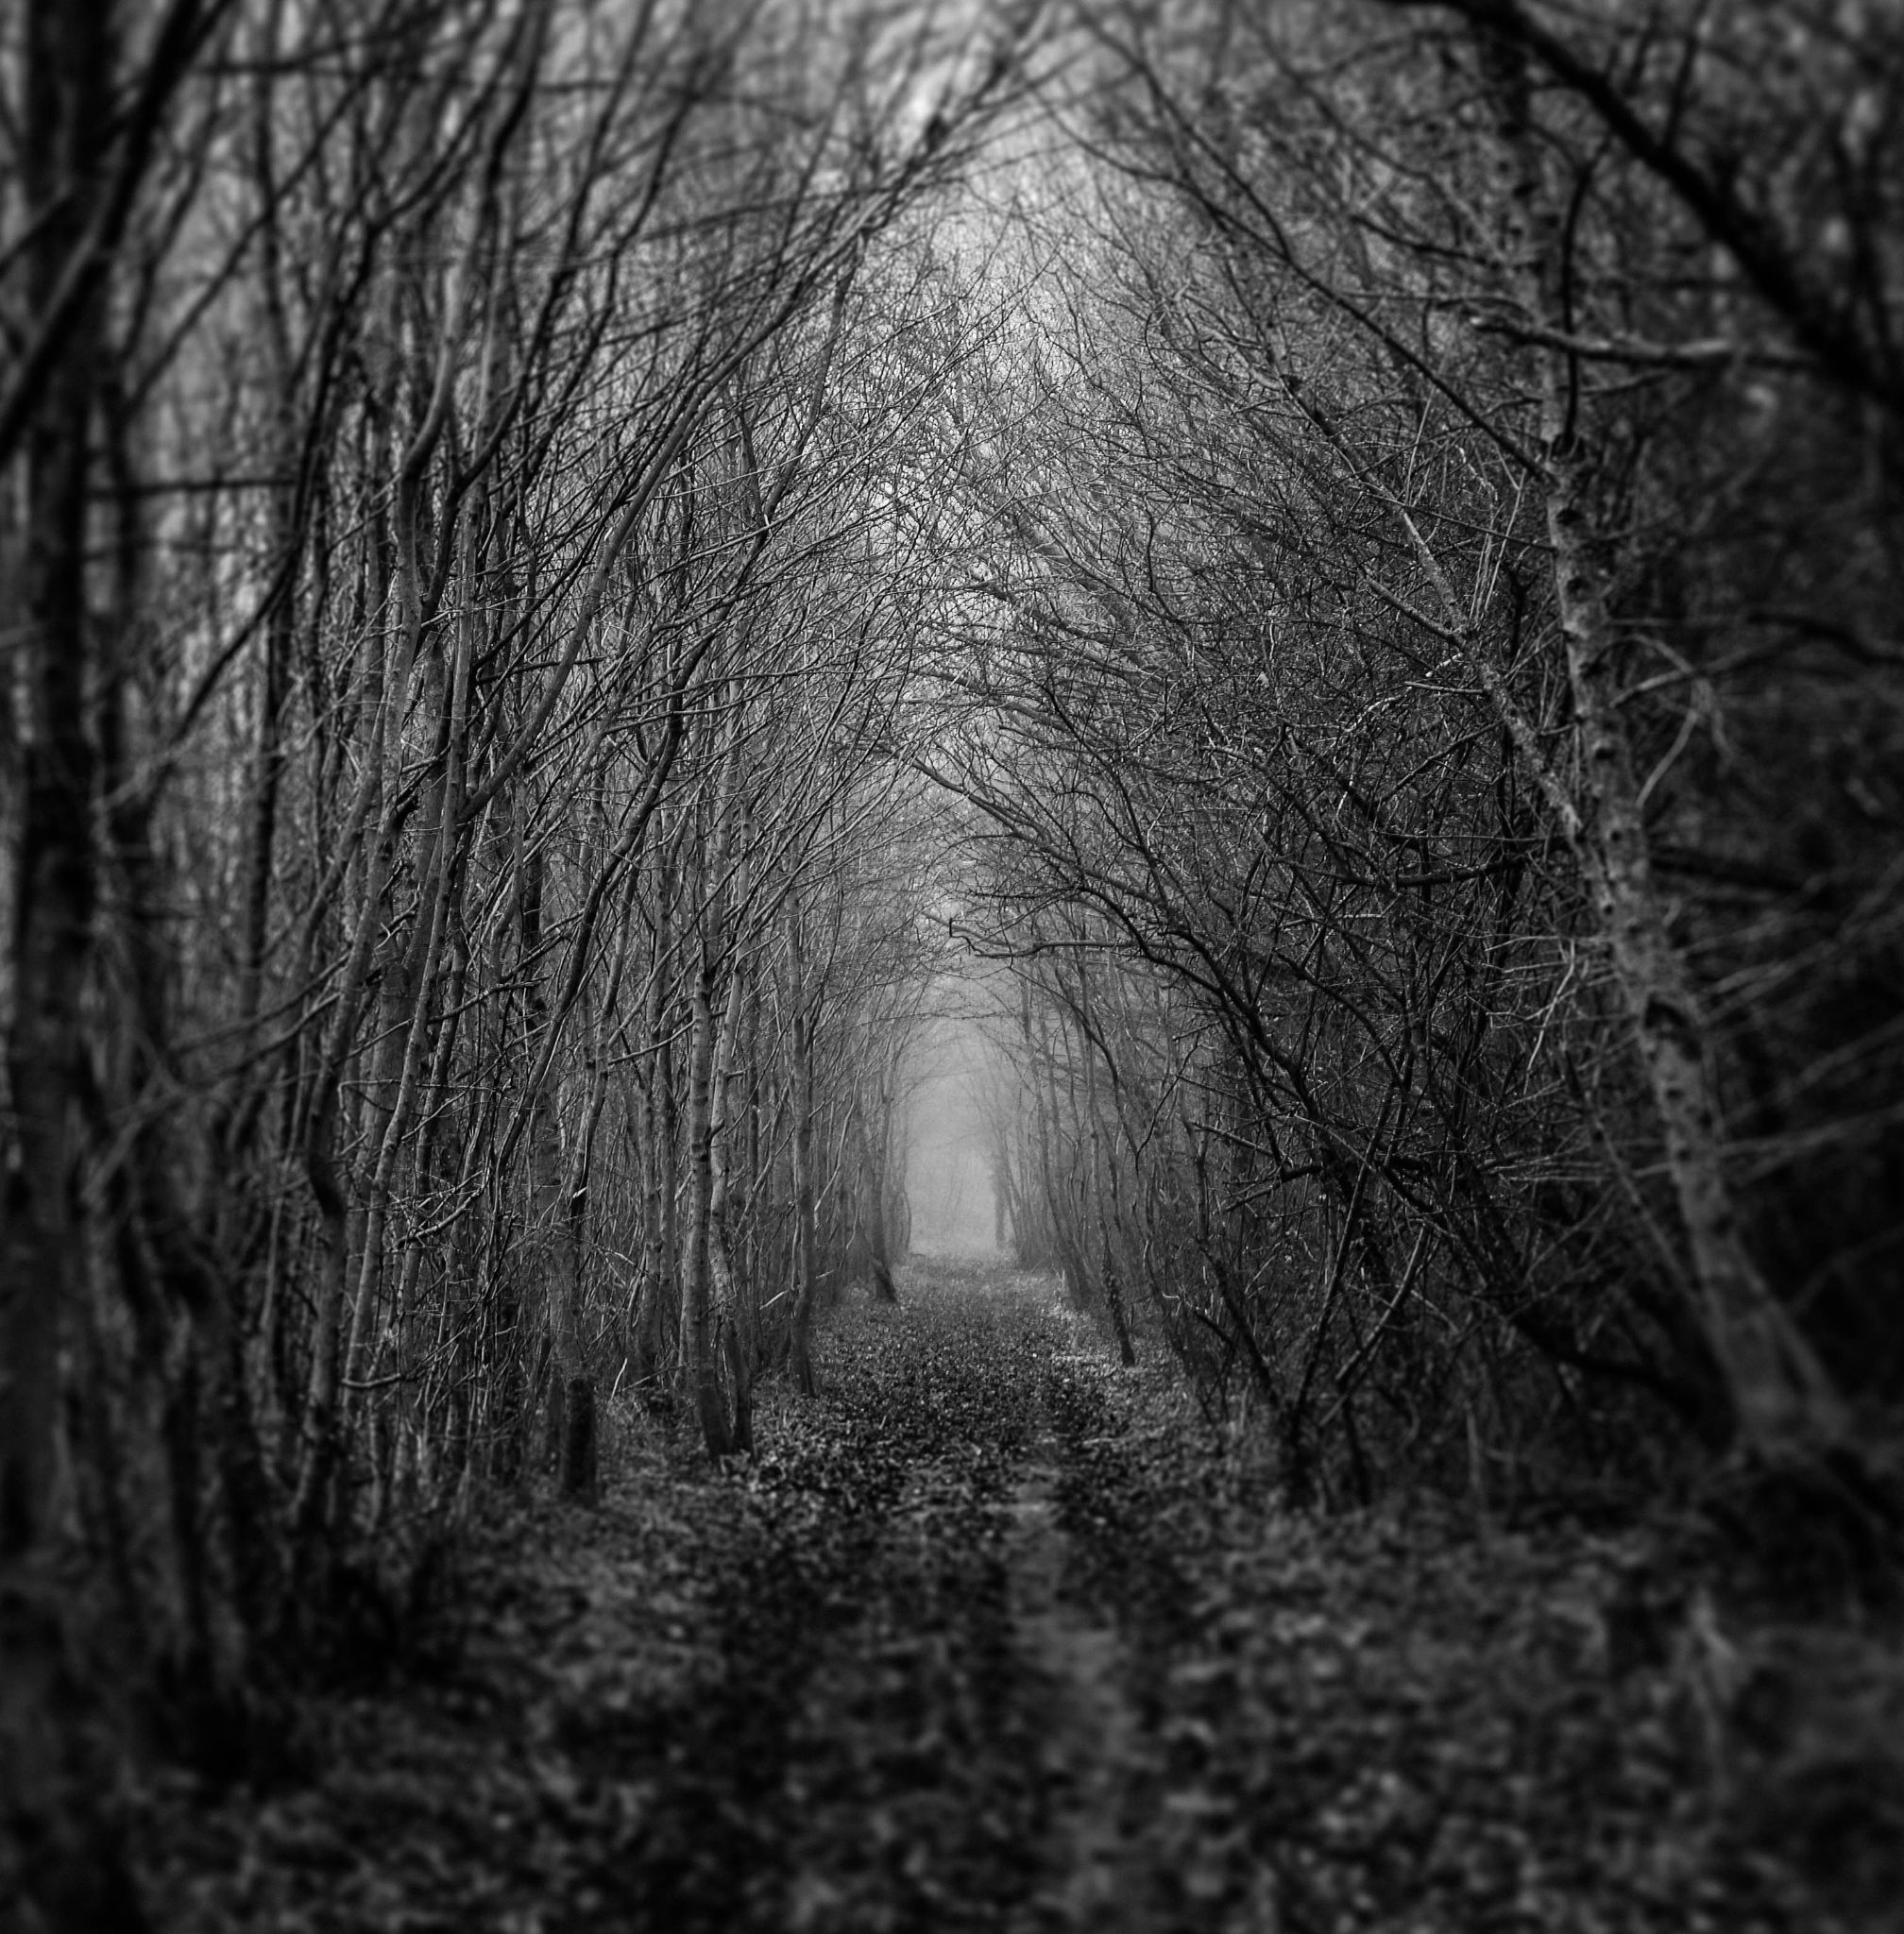 chemin mystique by willpatier